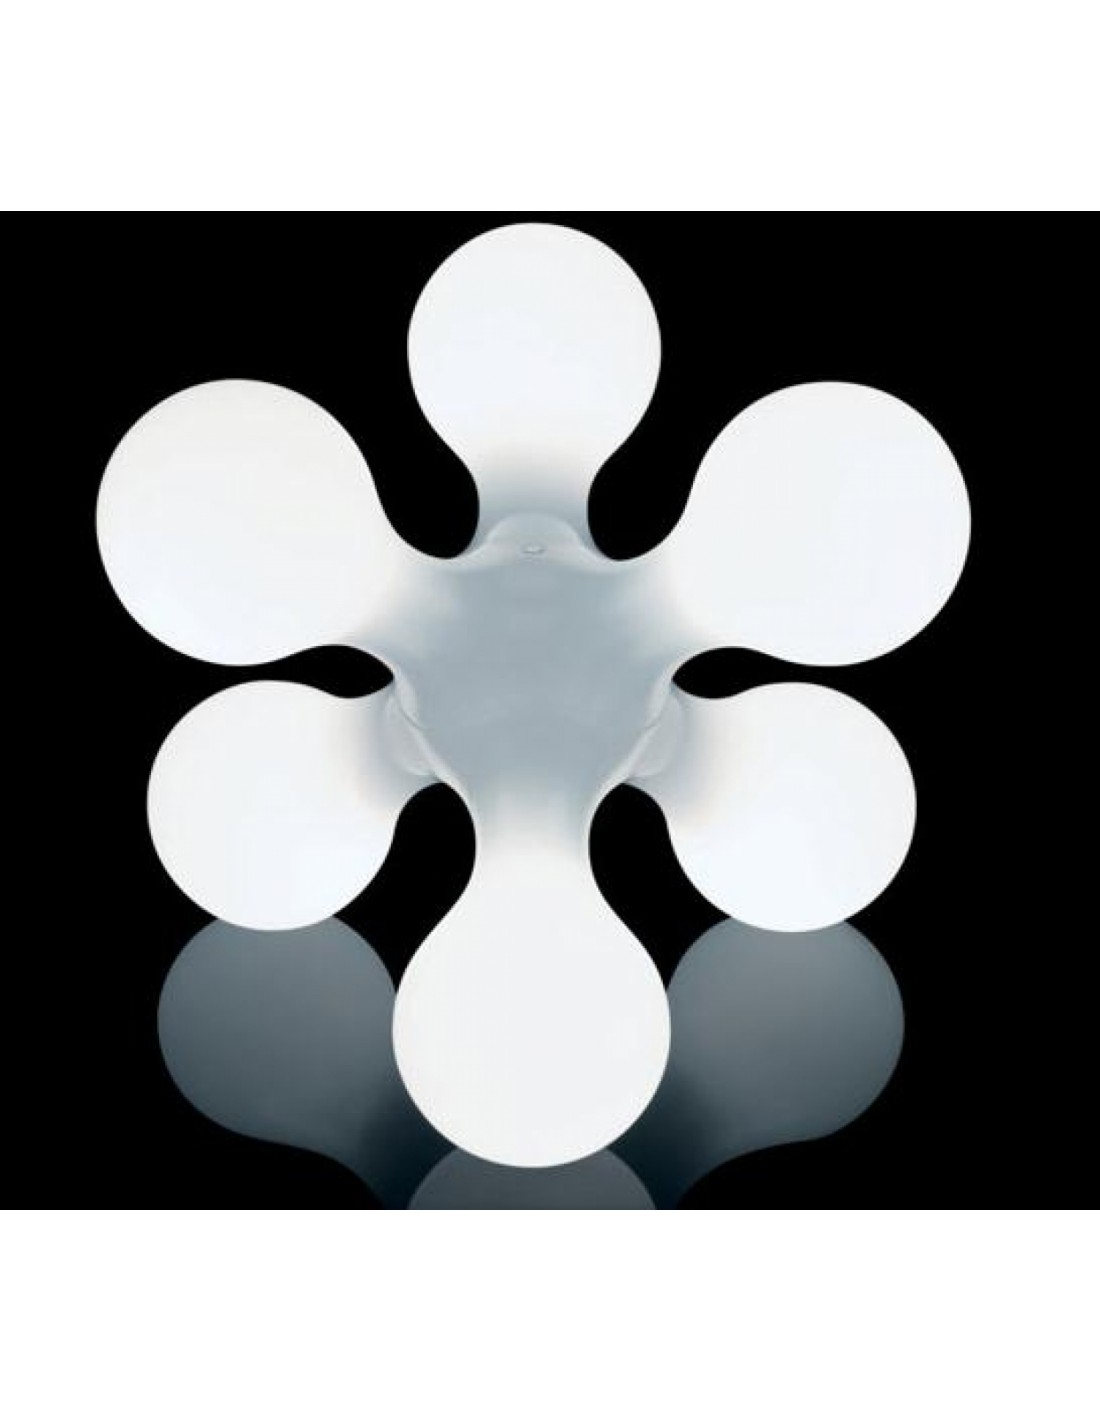 Lampe de sol Atomium pour la marque Kundalini